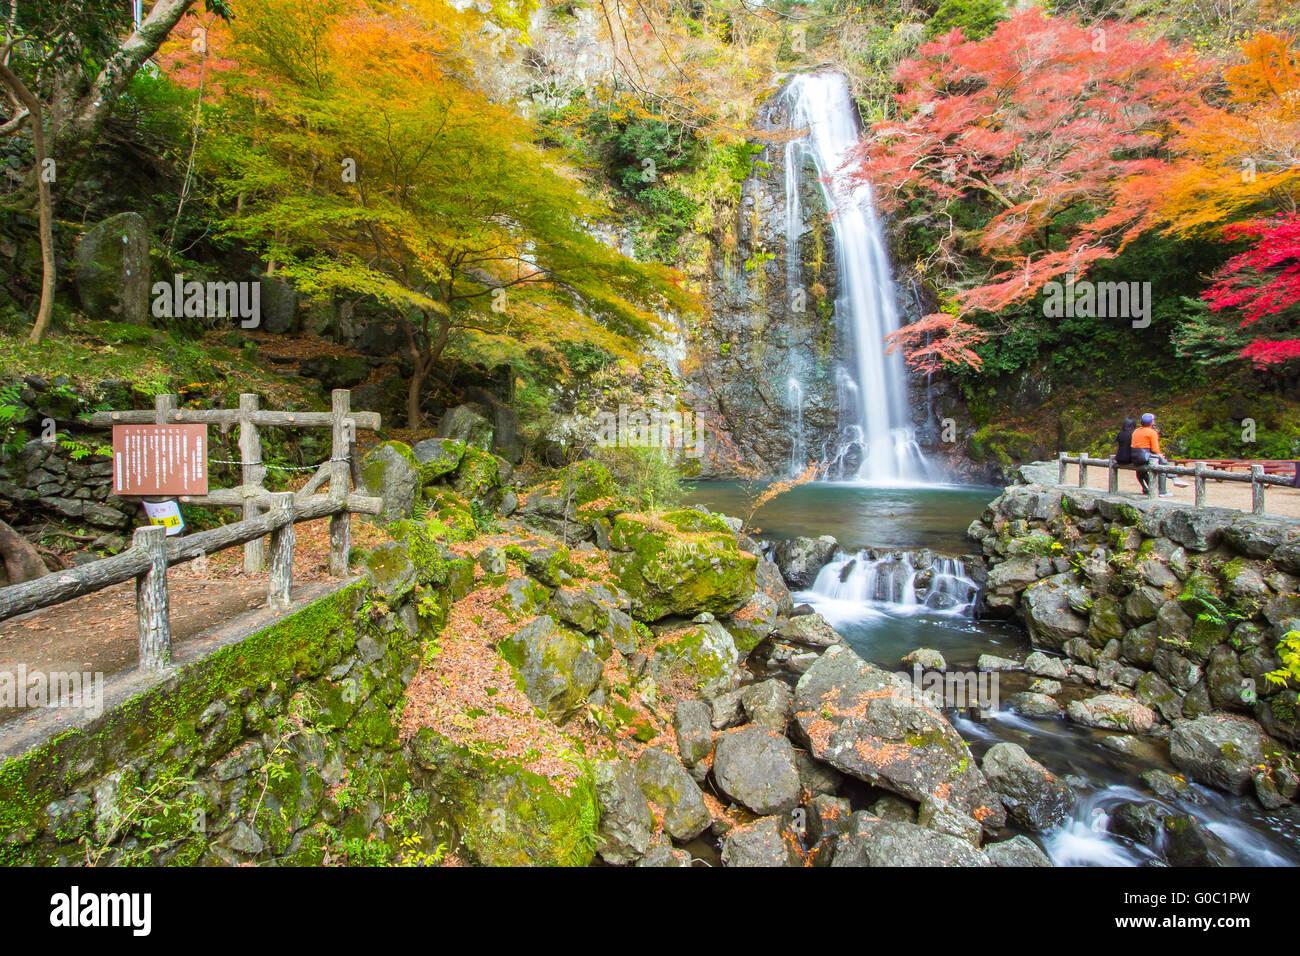 Autumn at Minoo Waterfall in Kansai, Japan. - Stock Image